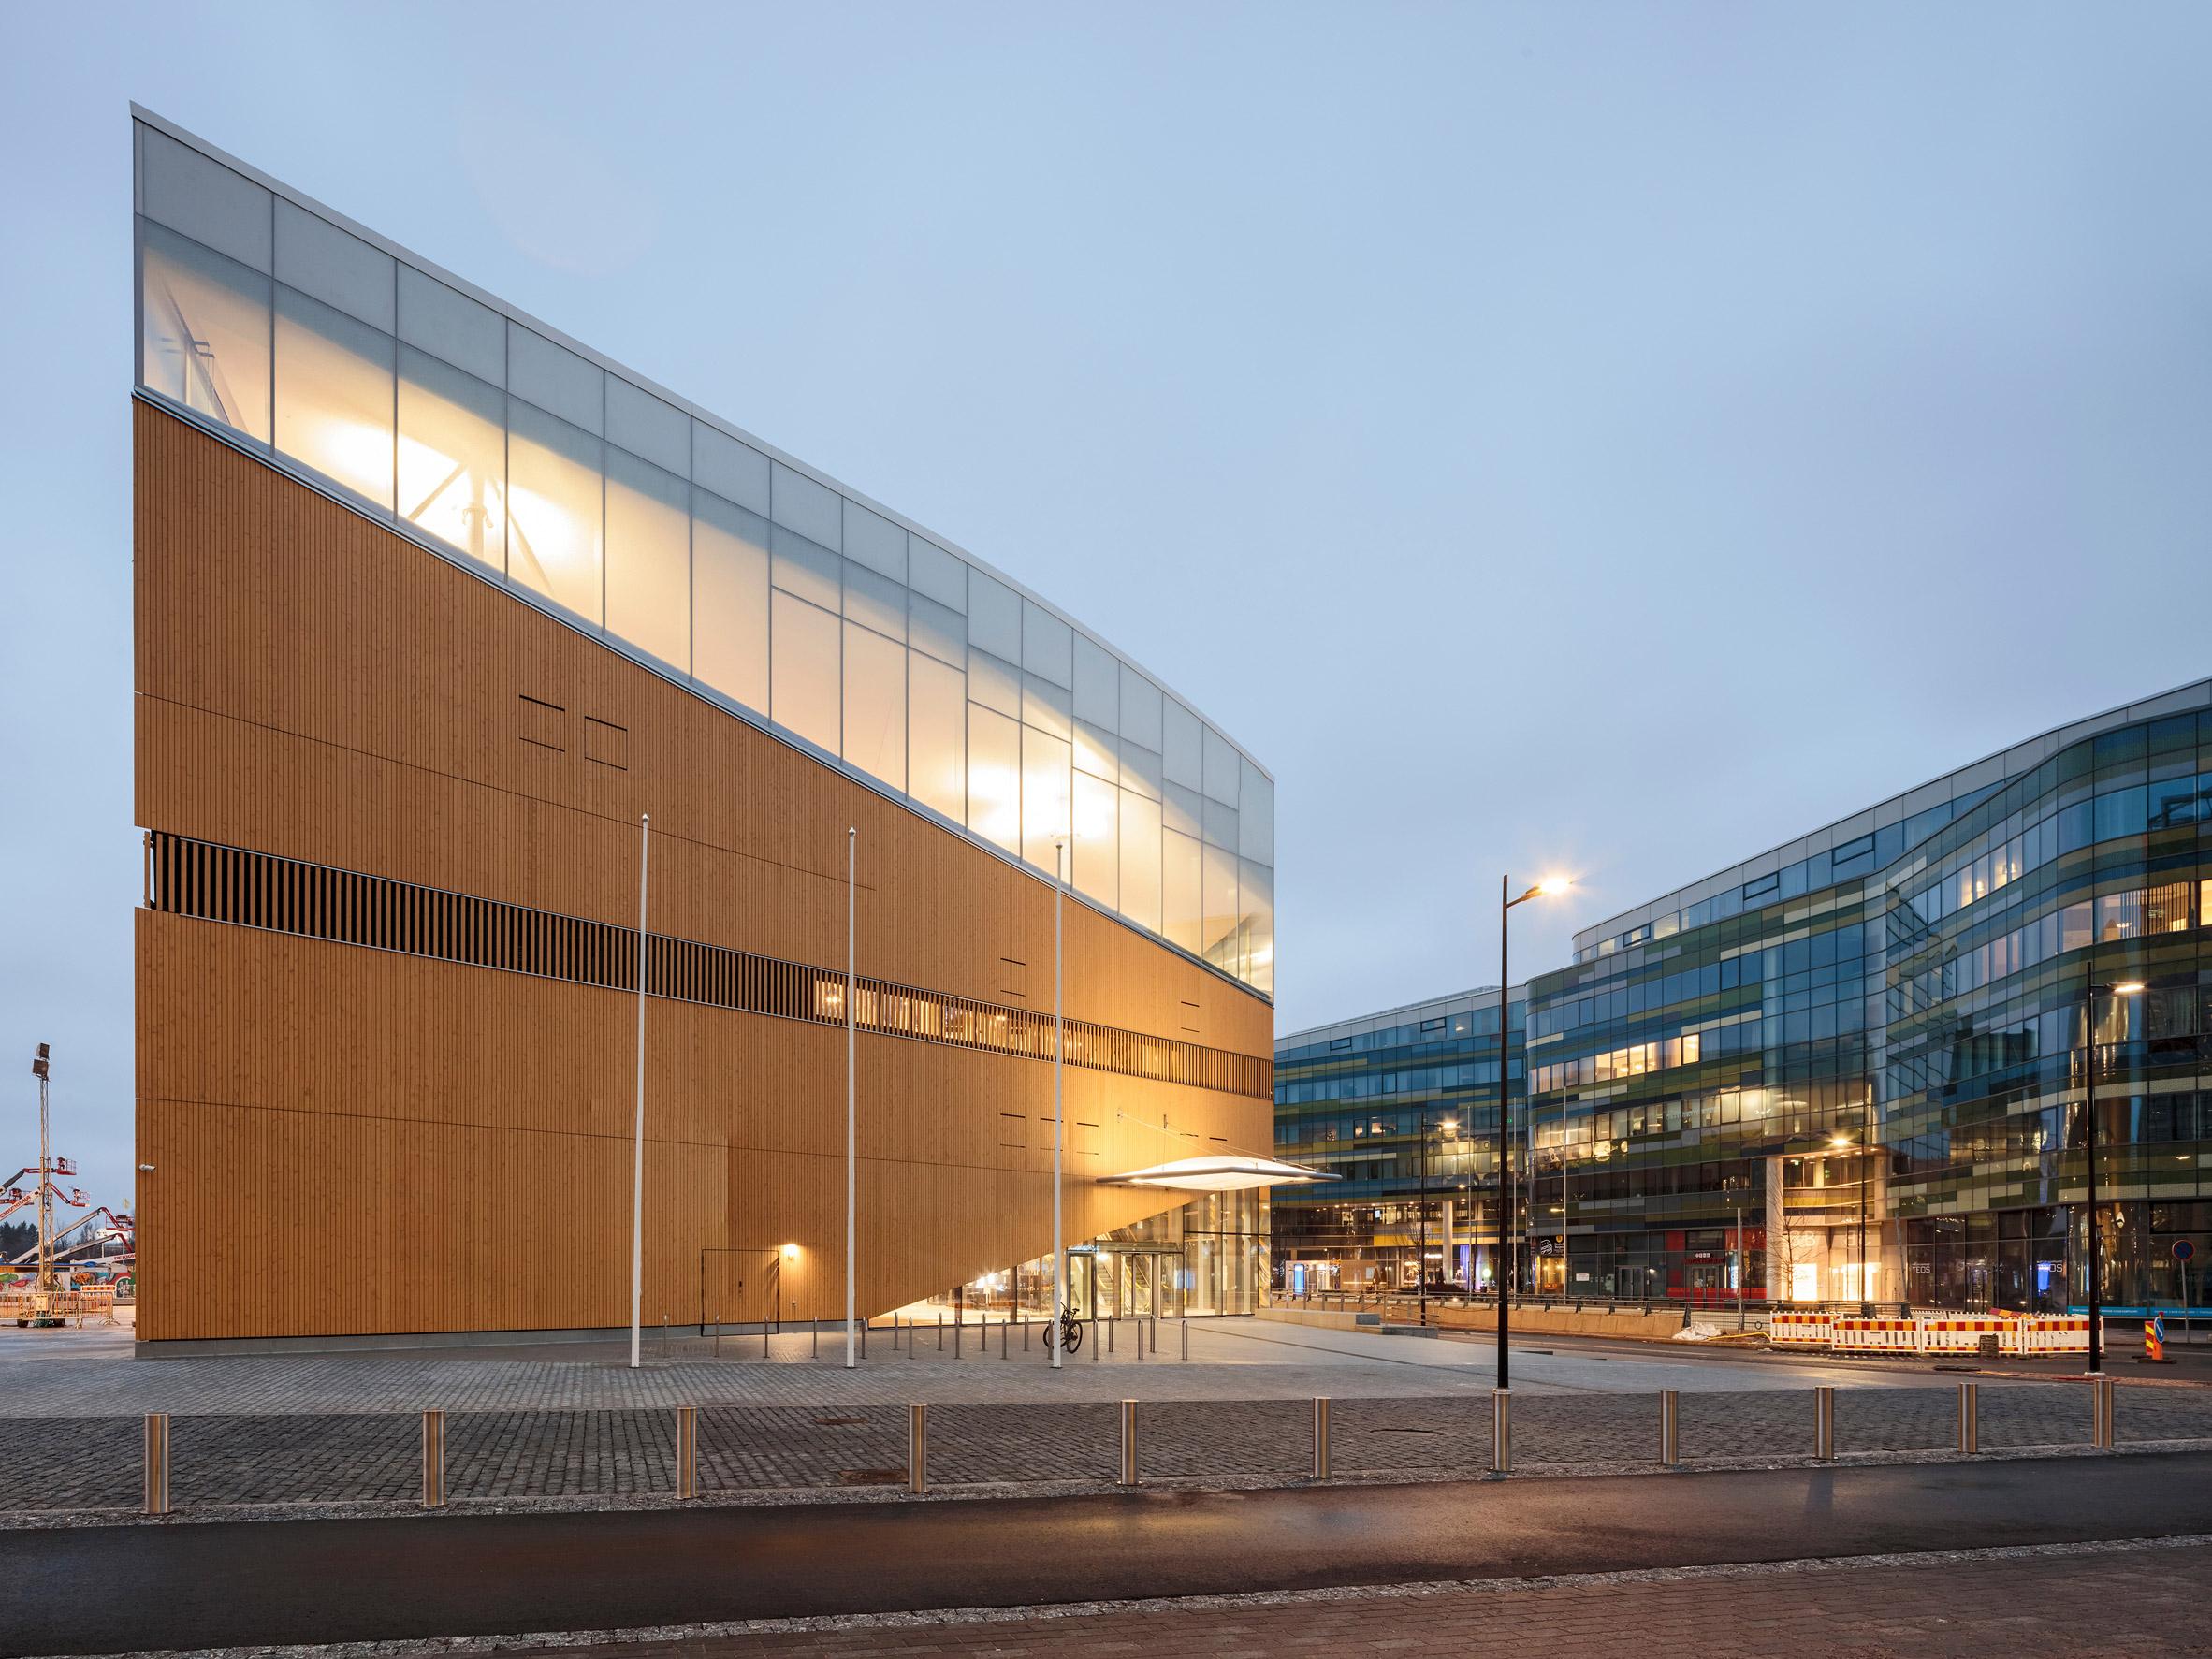 Helsinki Central Library Oodi by ALA Architects